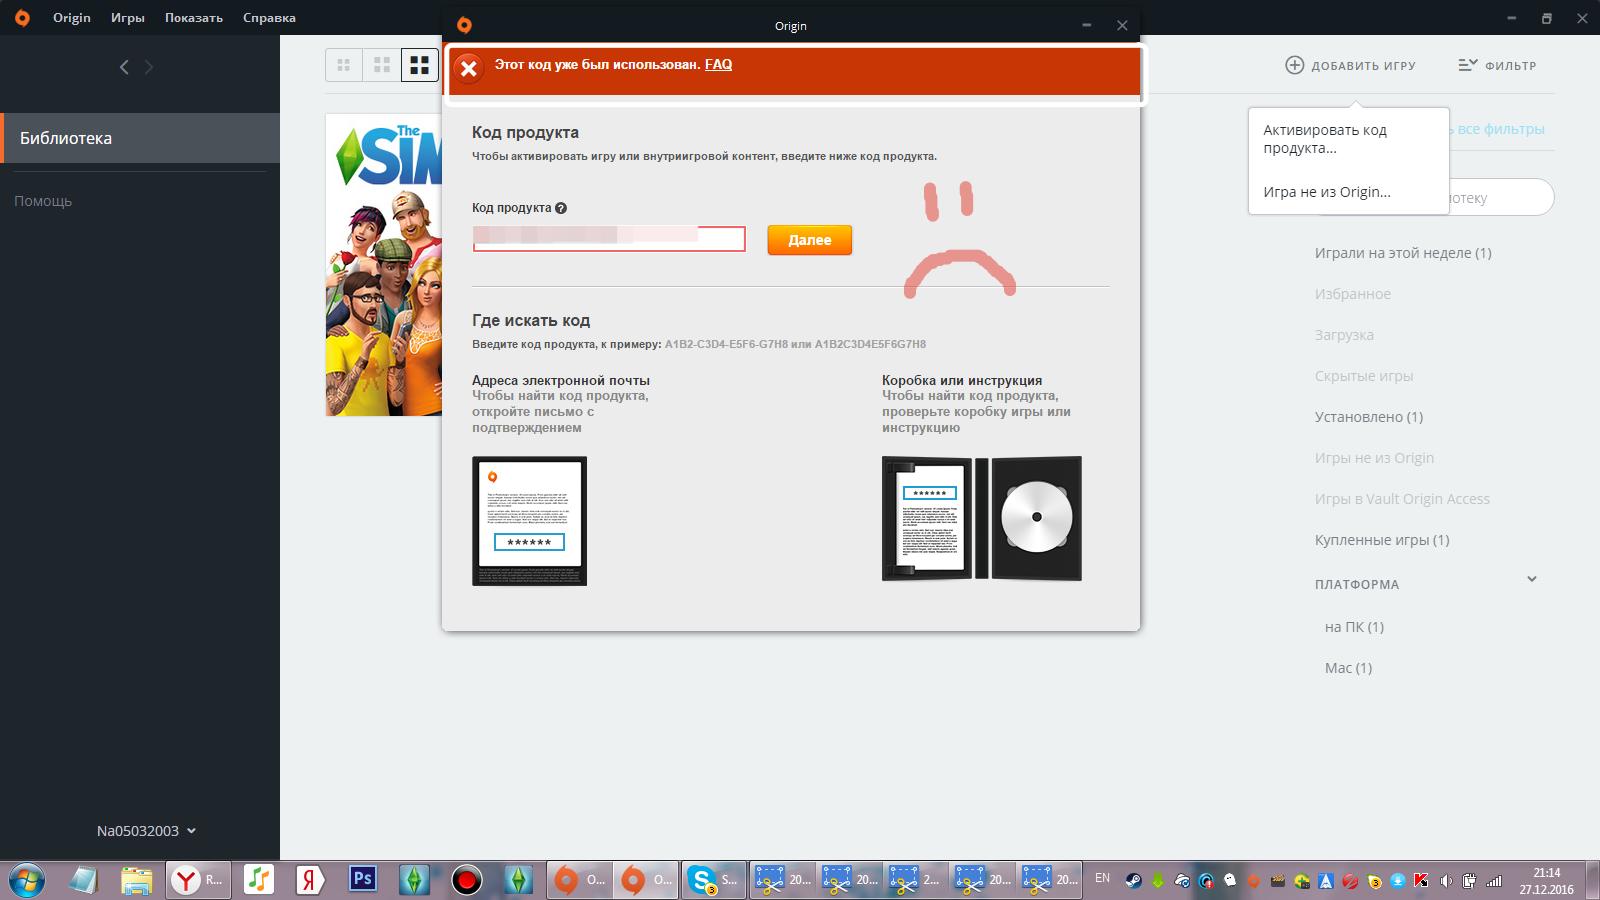 Код Продукта Displayname Field Missing From Registry Fifa 15